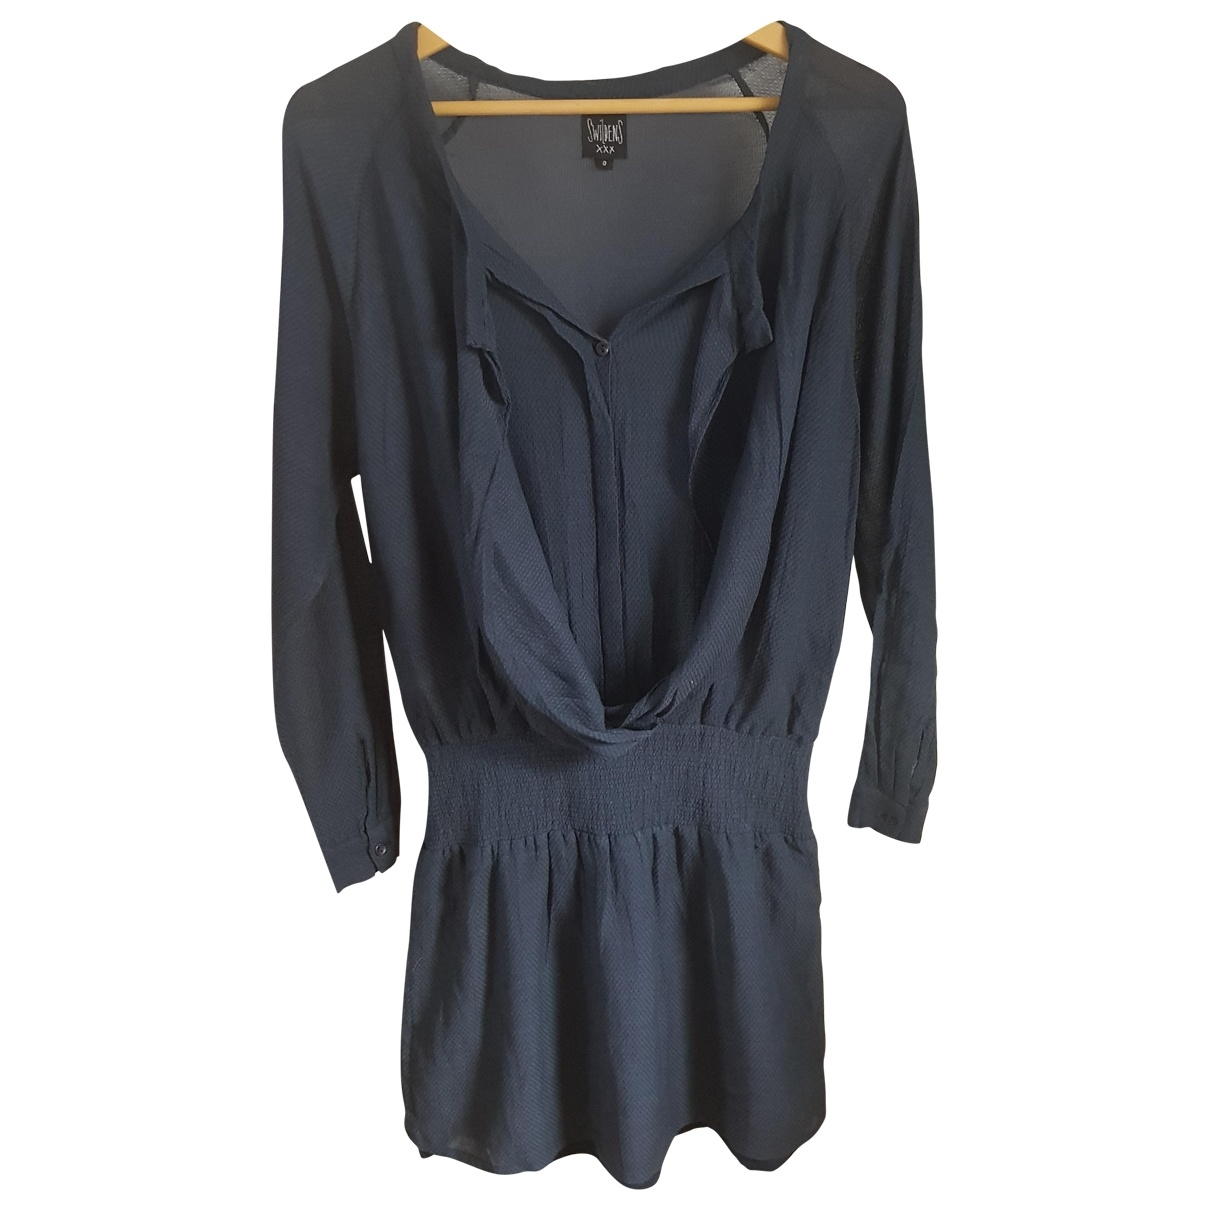 Swildens \N Grey Cotton dress for Women 0 0-5